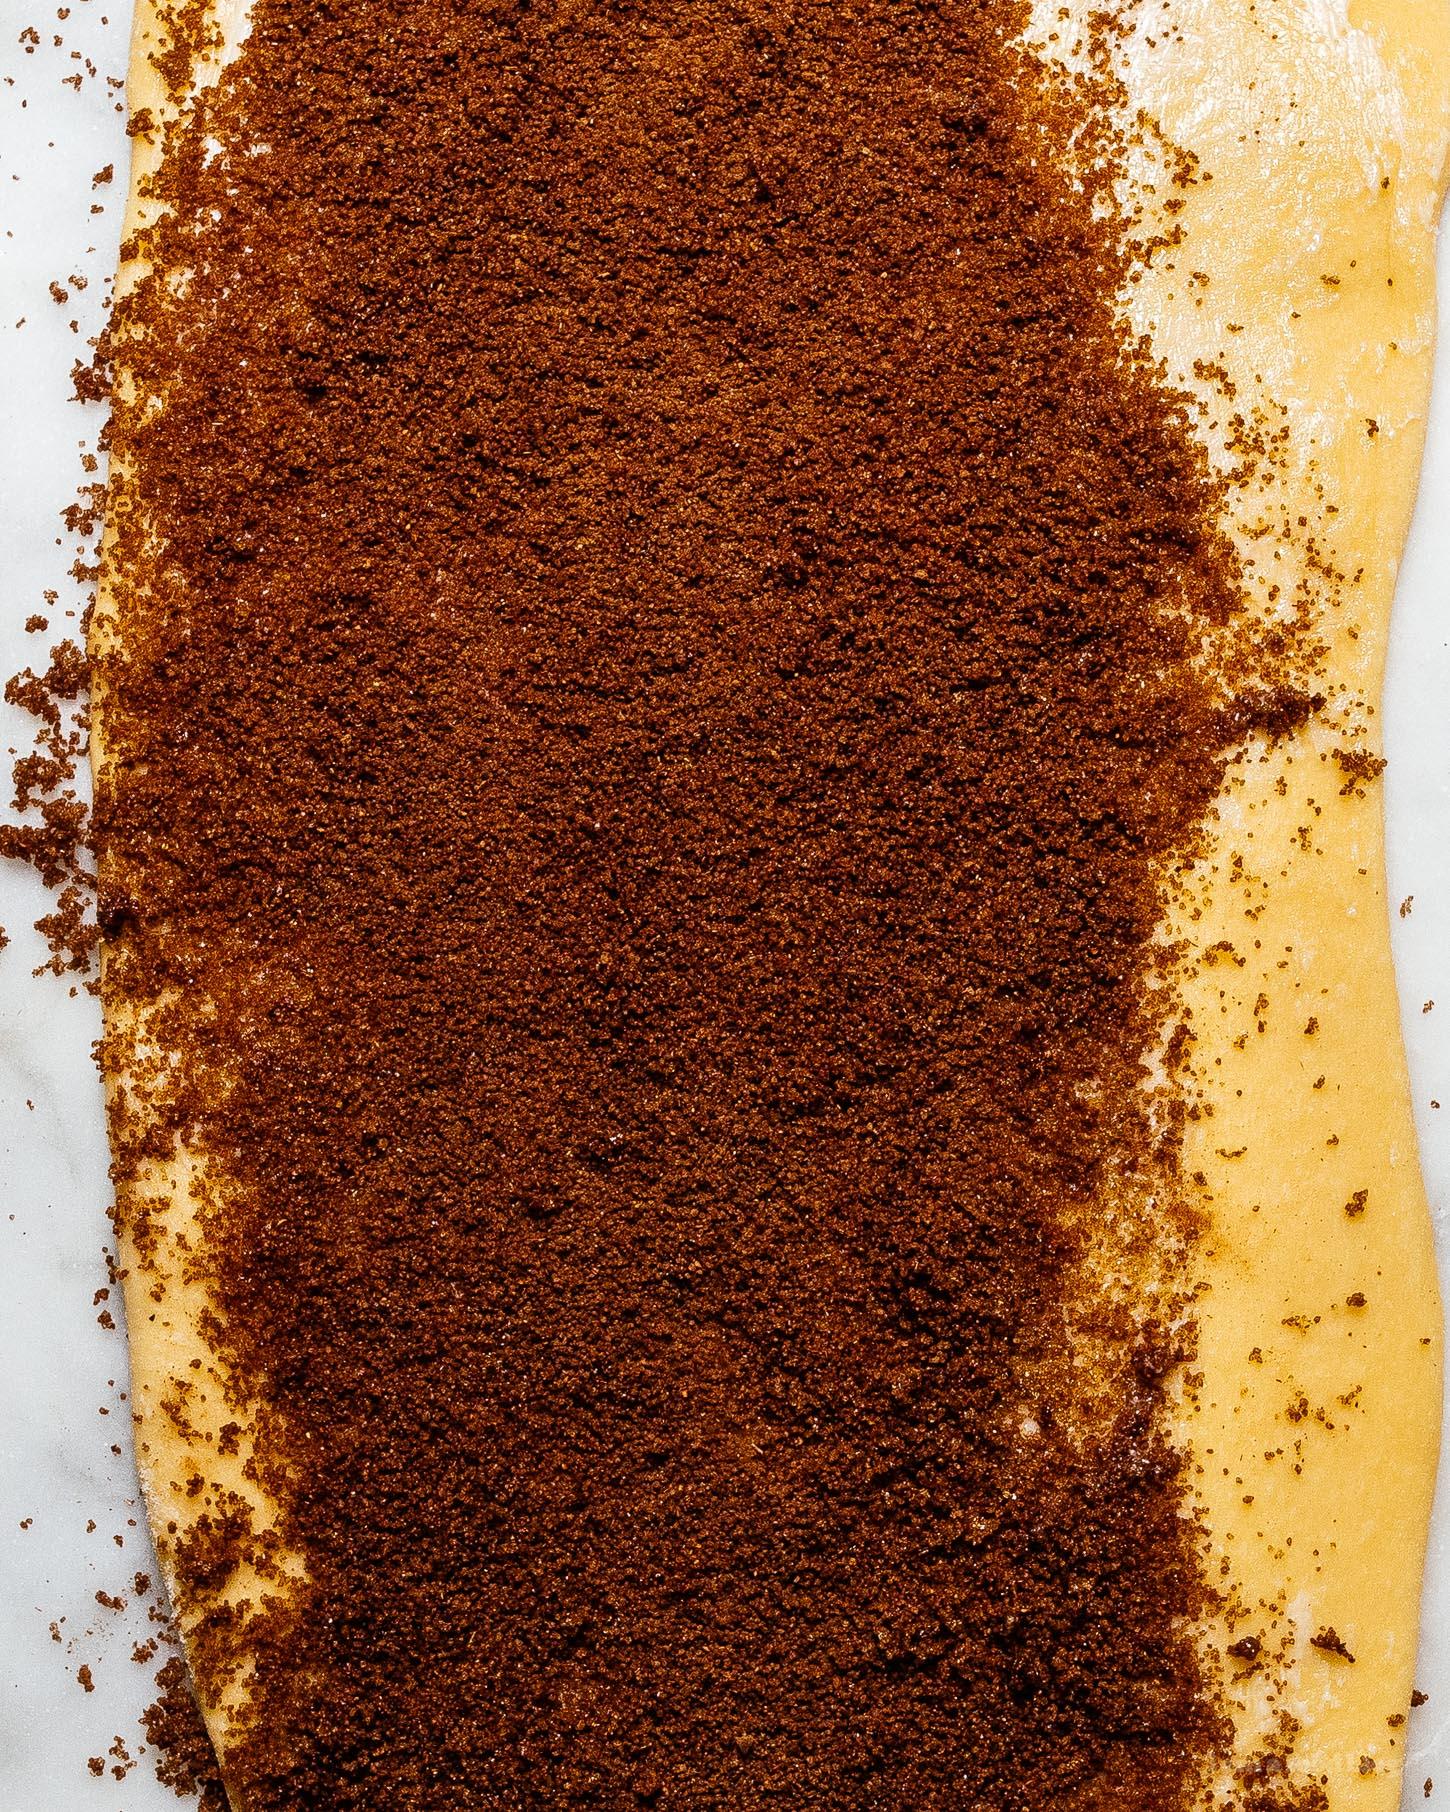 small batch mini sticky bun cinnamon roll monkey bread #smallbatch #recipe #baking #stickybun #morningbun #cinnamonrolls #cinnamonbuns #monkeybread #cinnamon